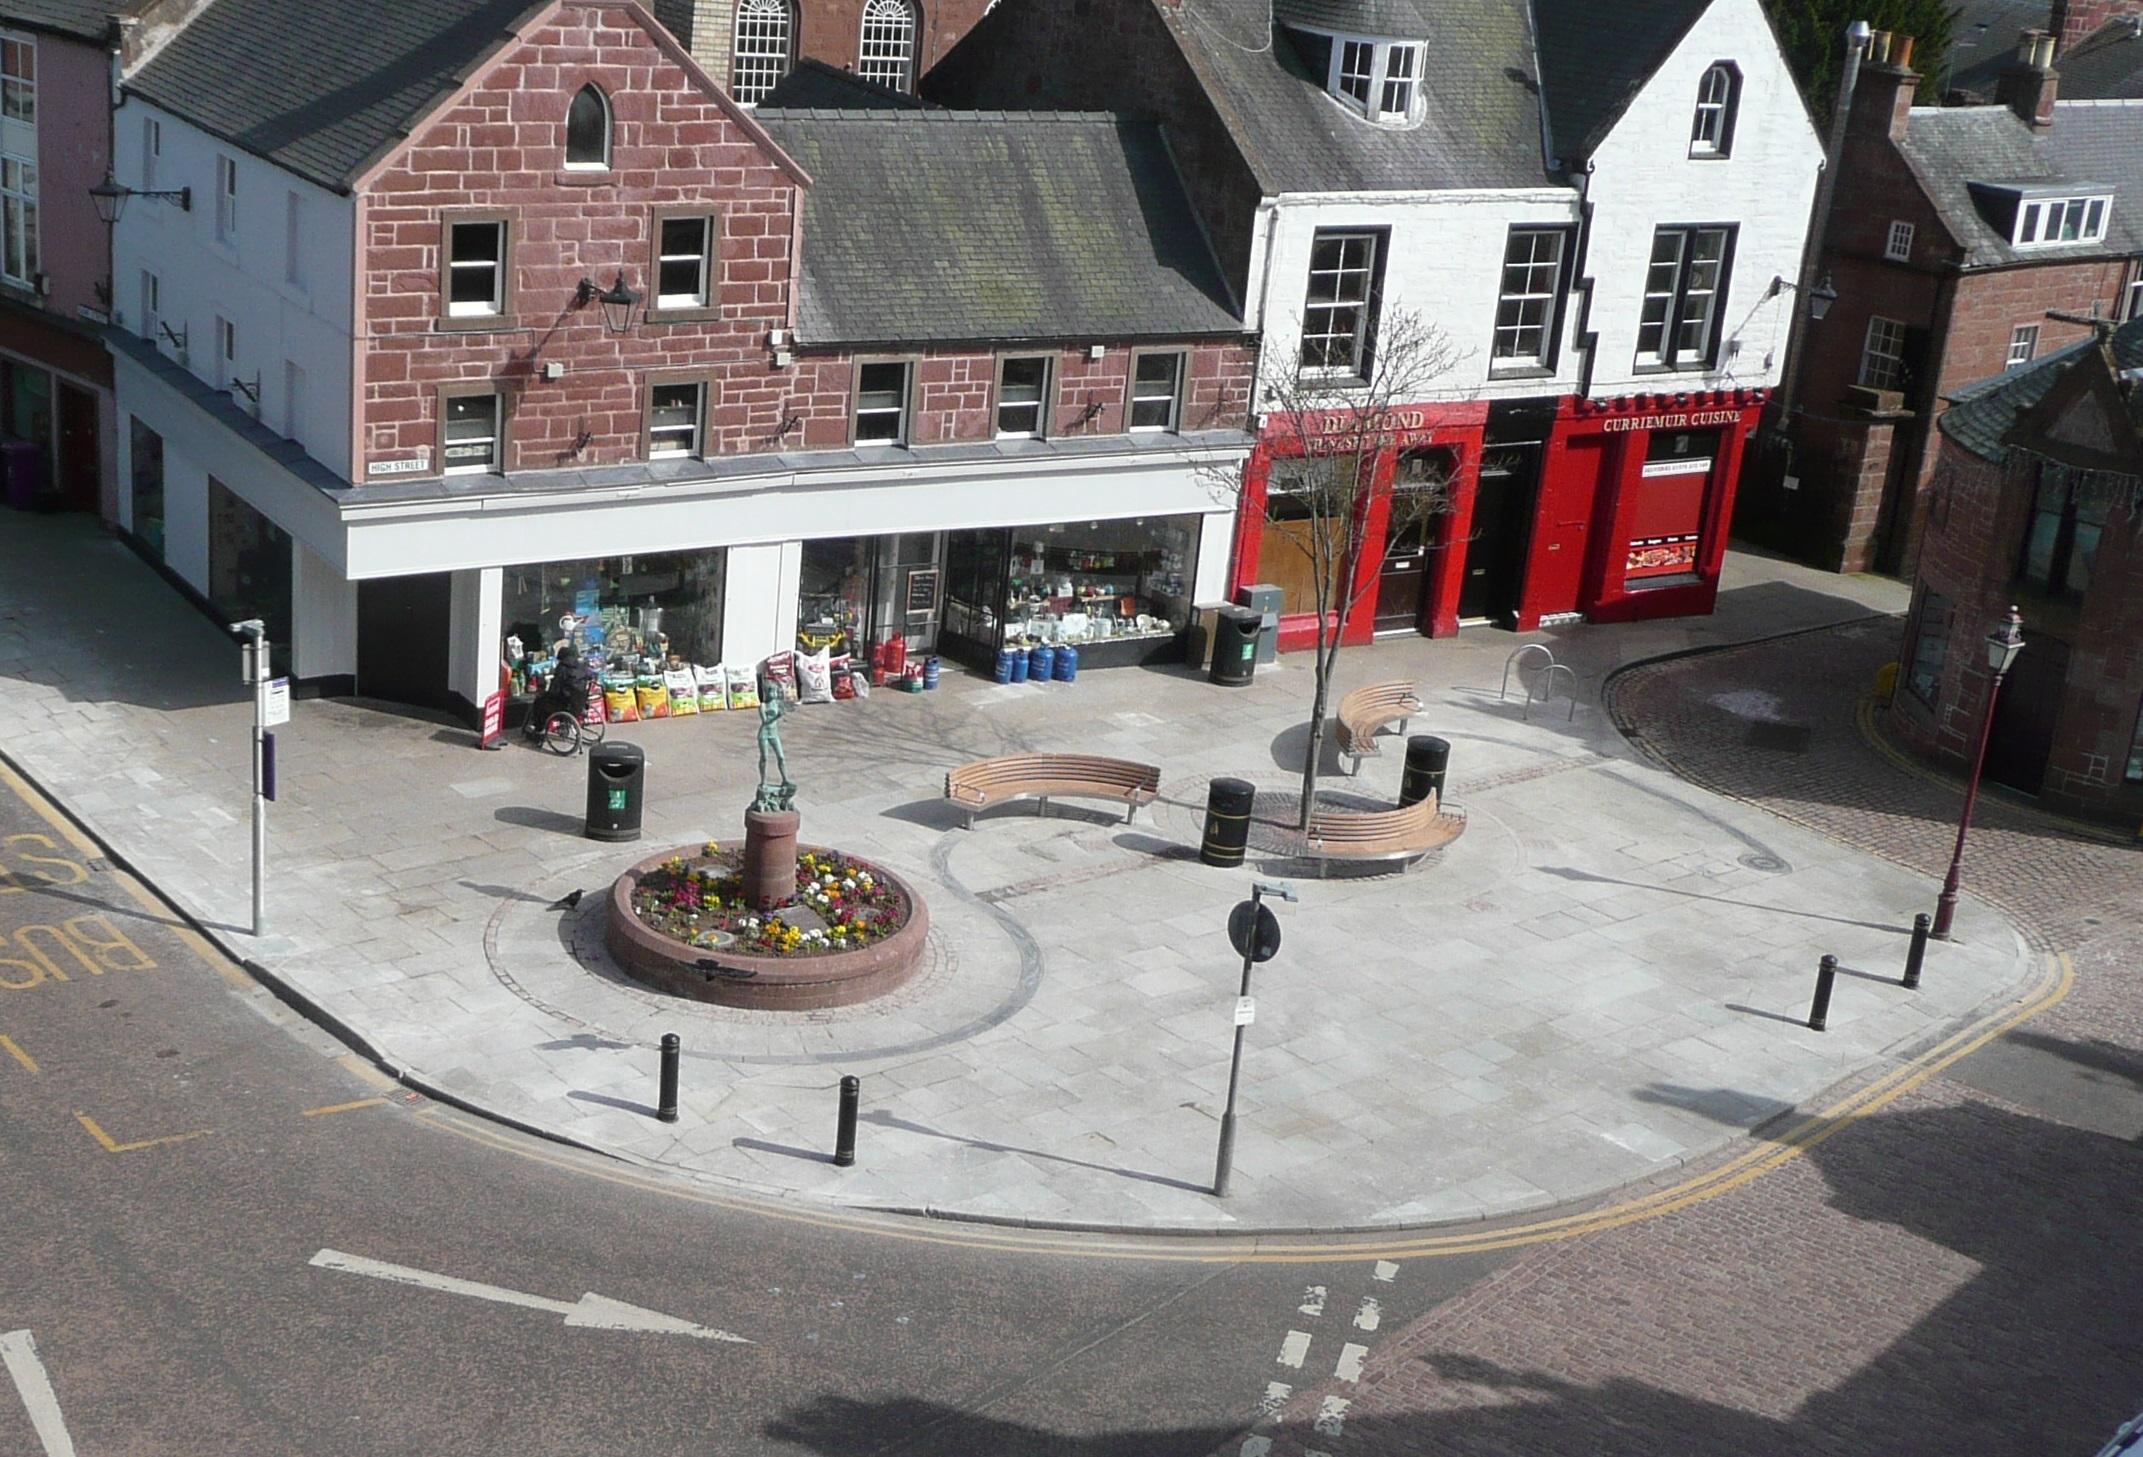 Kirriemuir town centre.